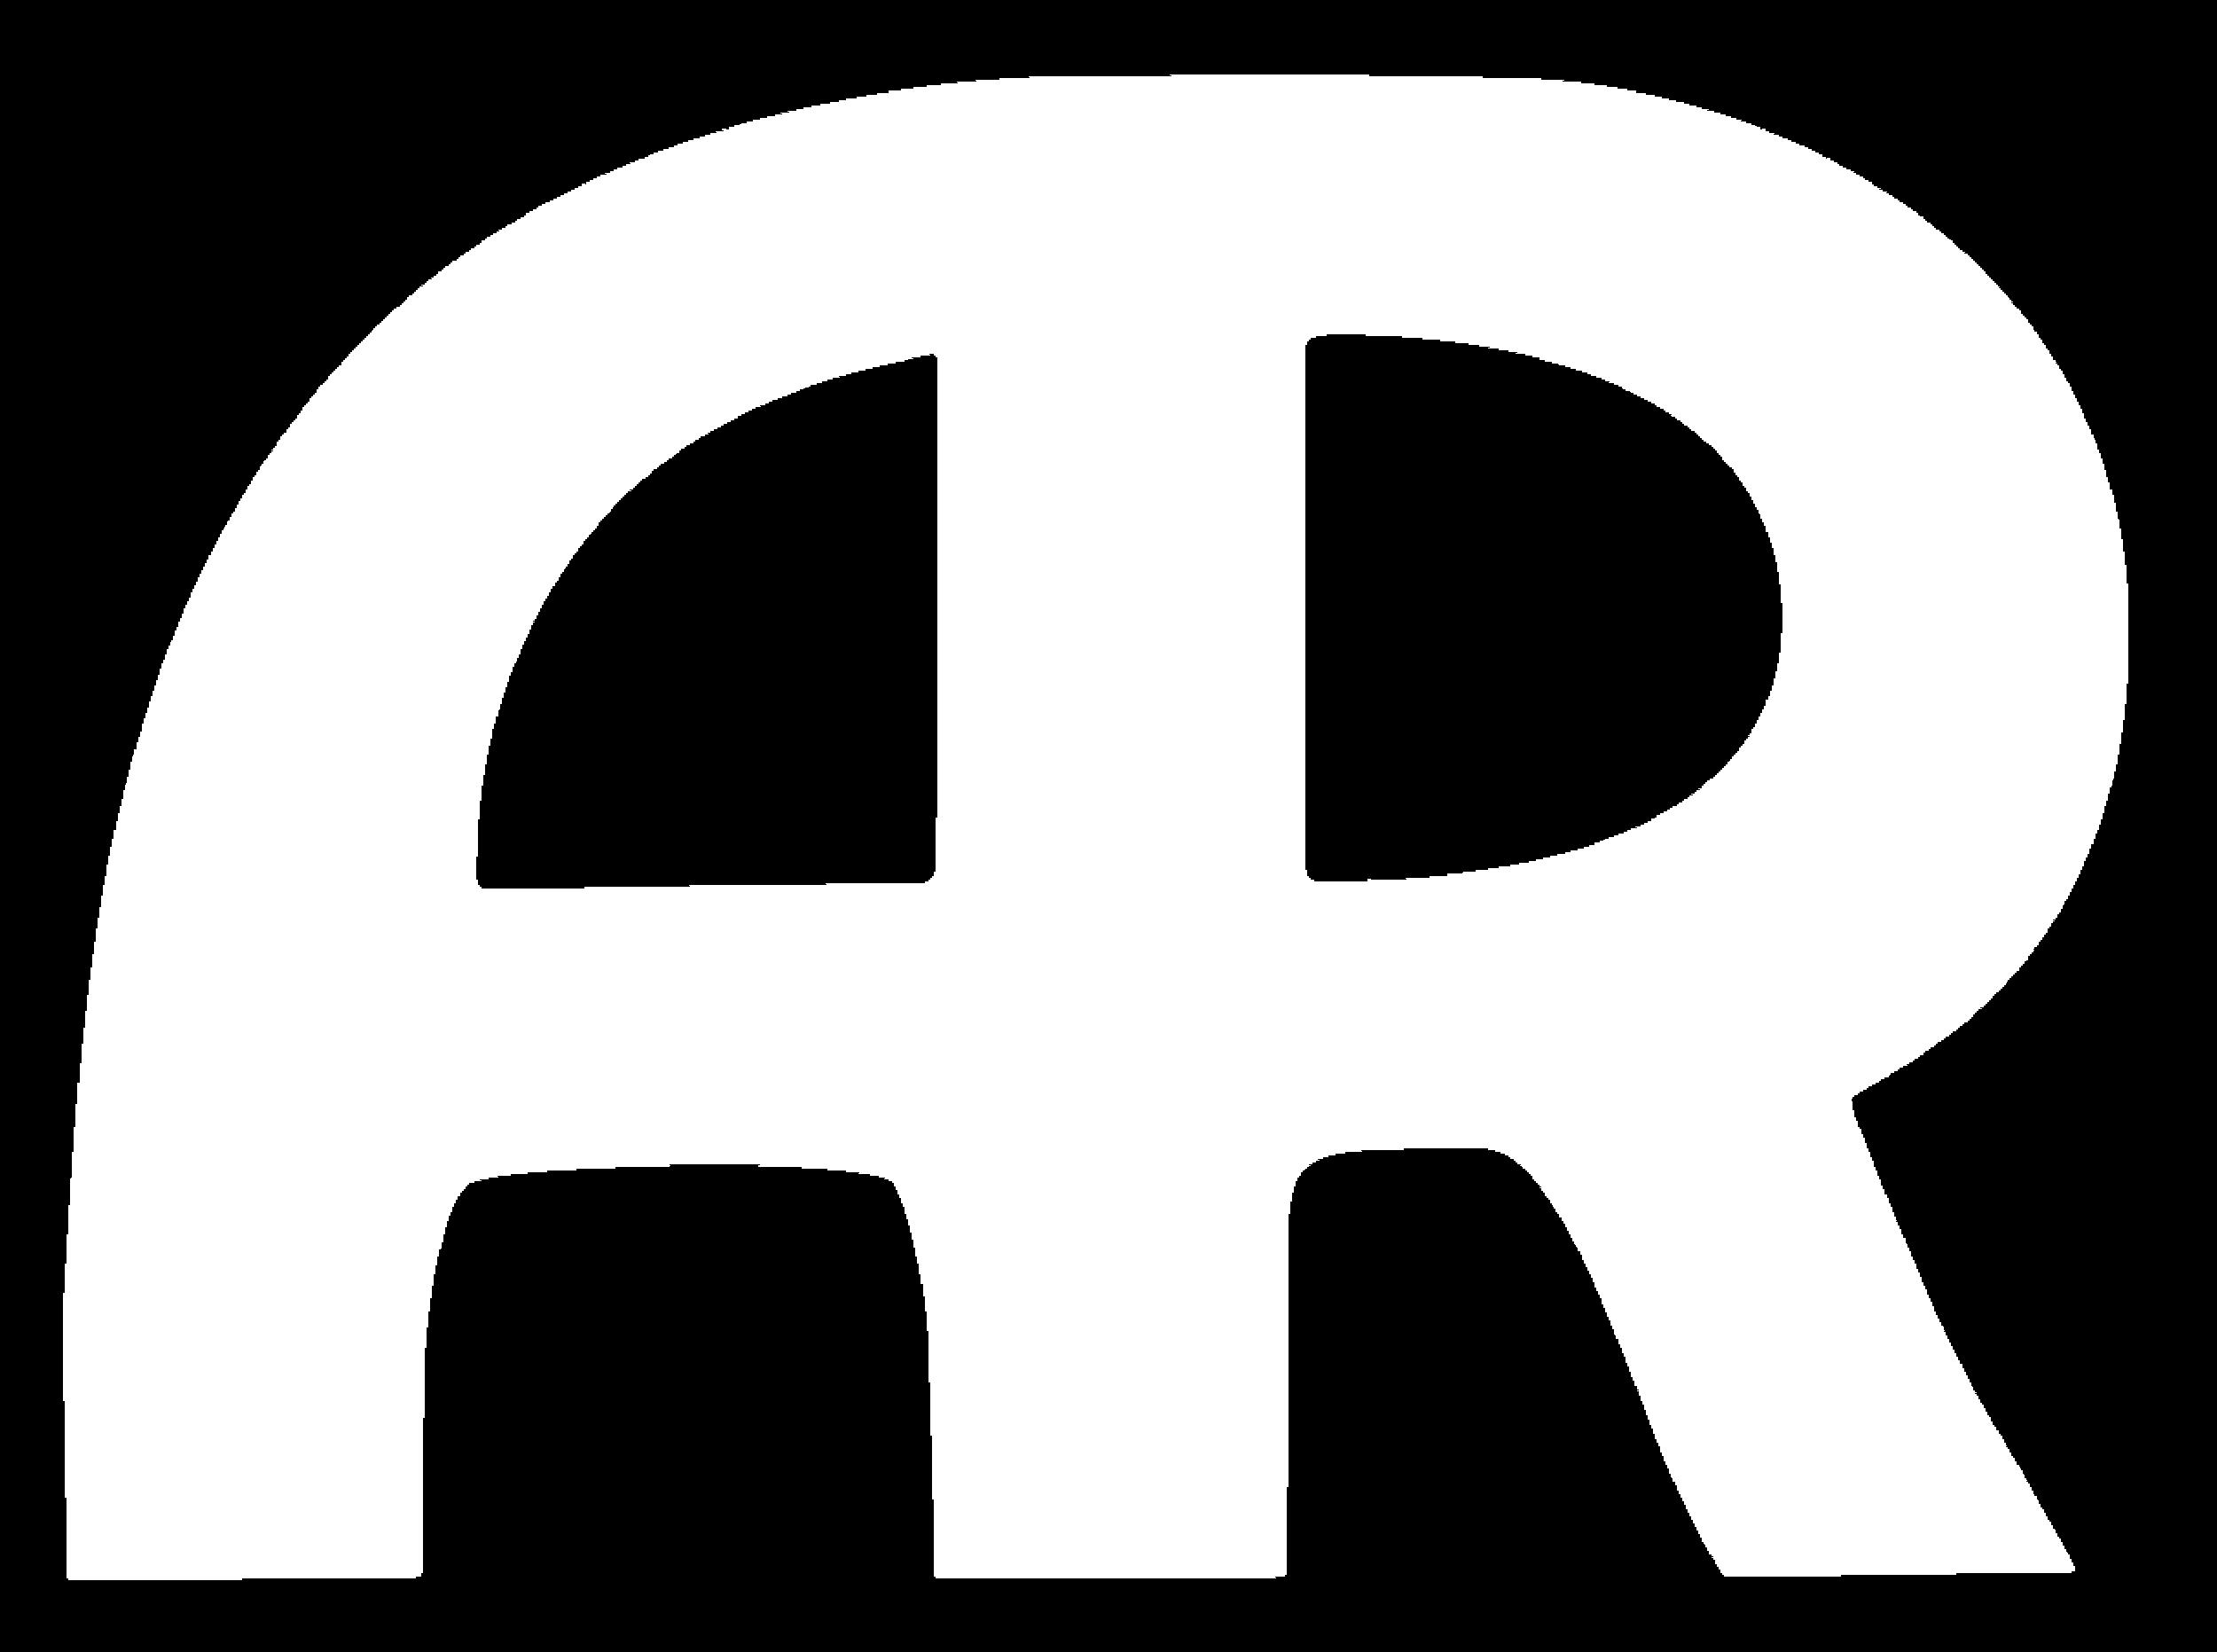 ar_logo_white.png